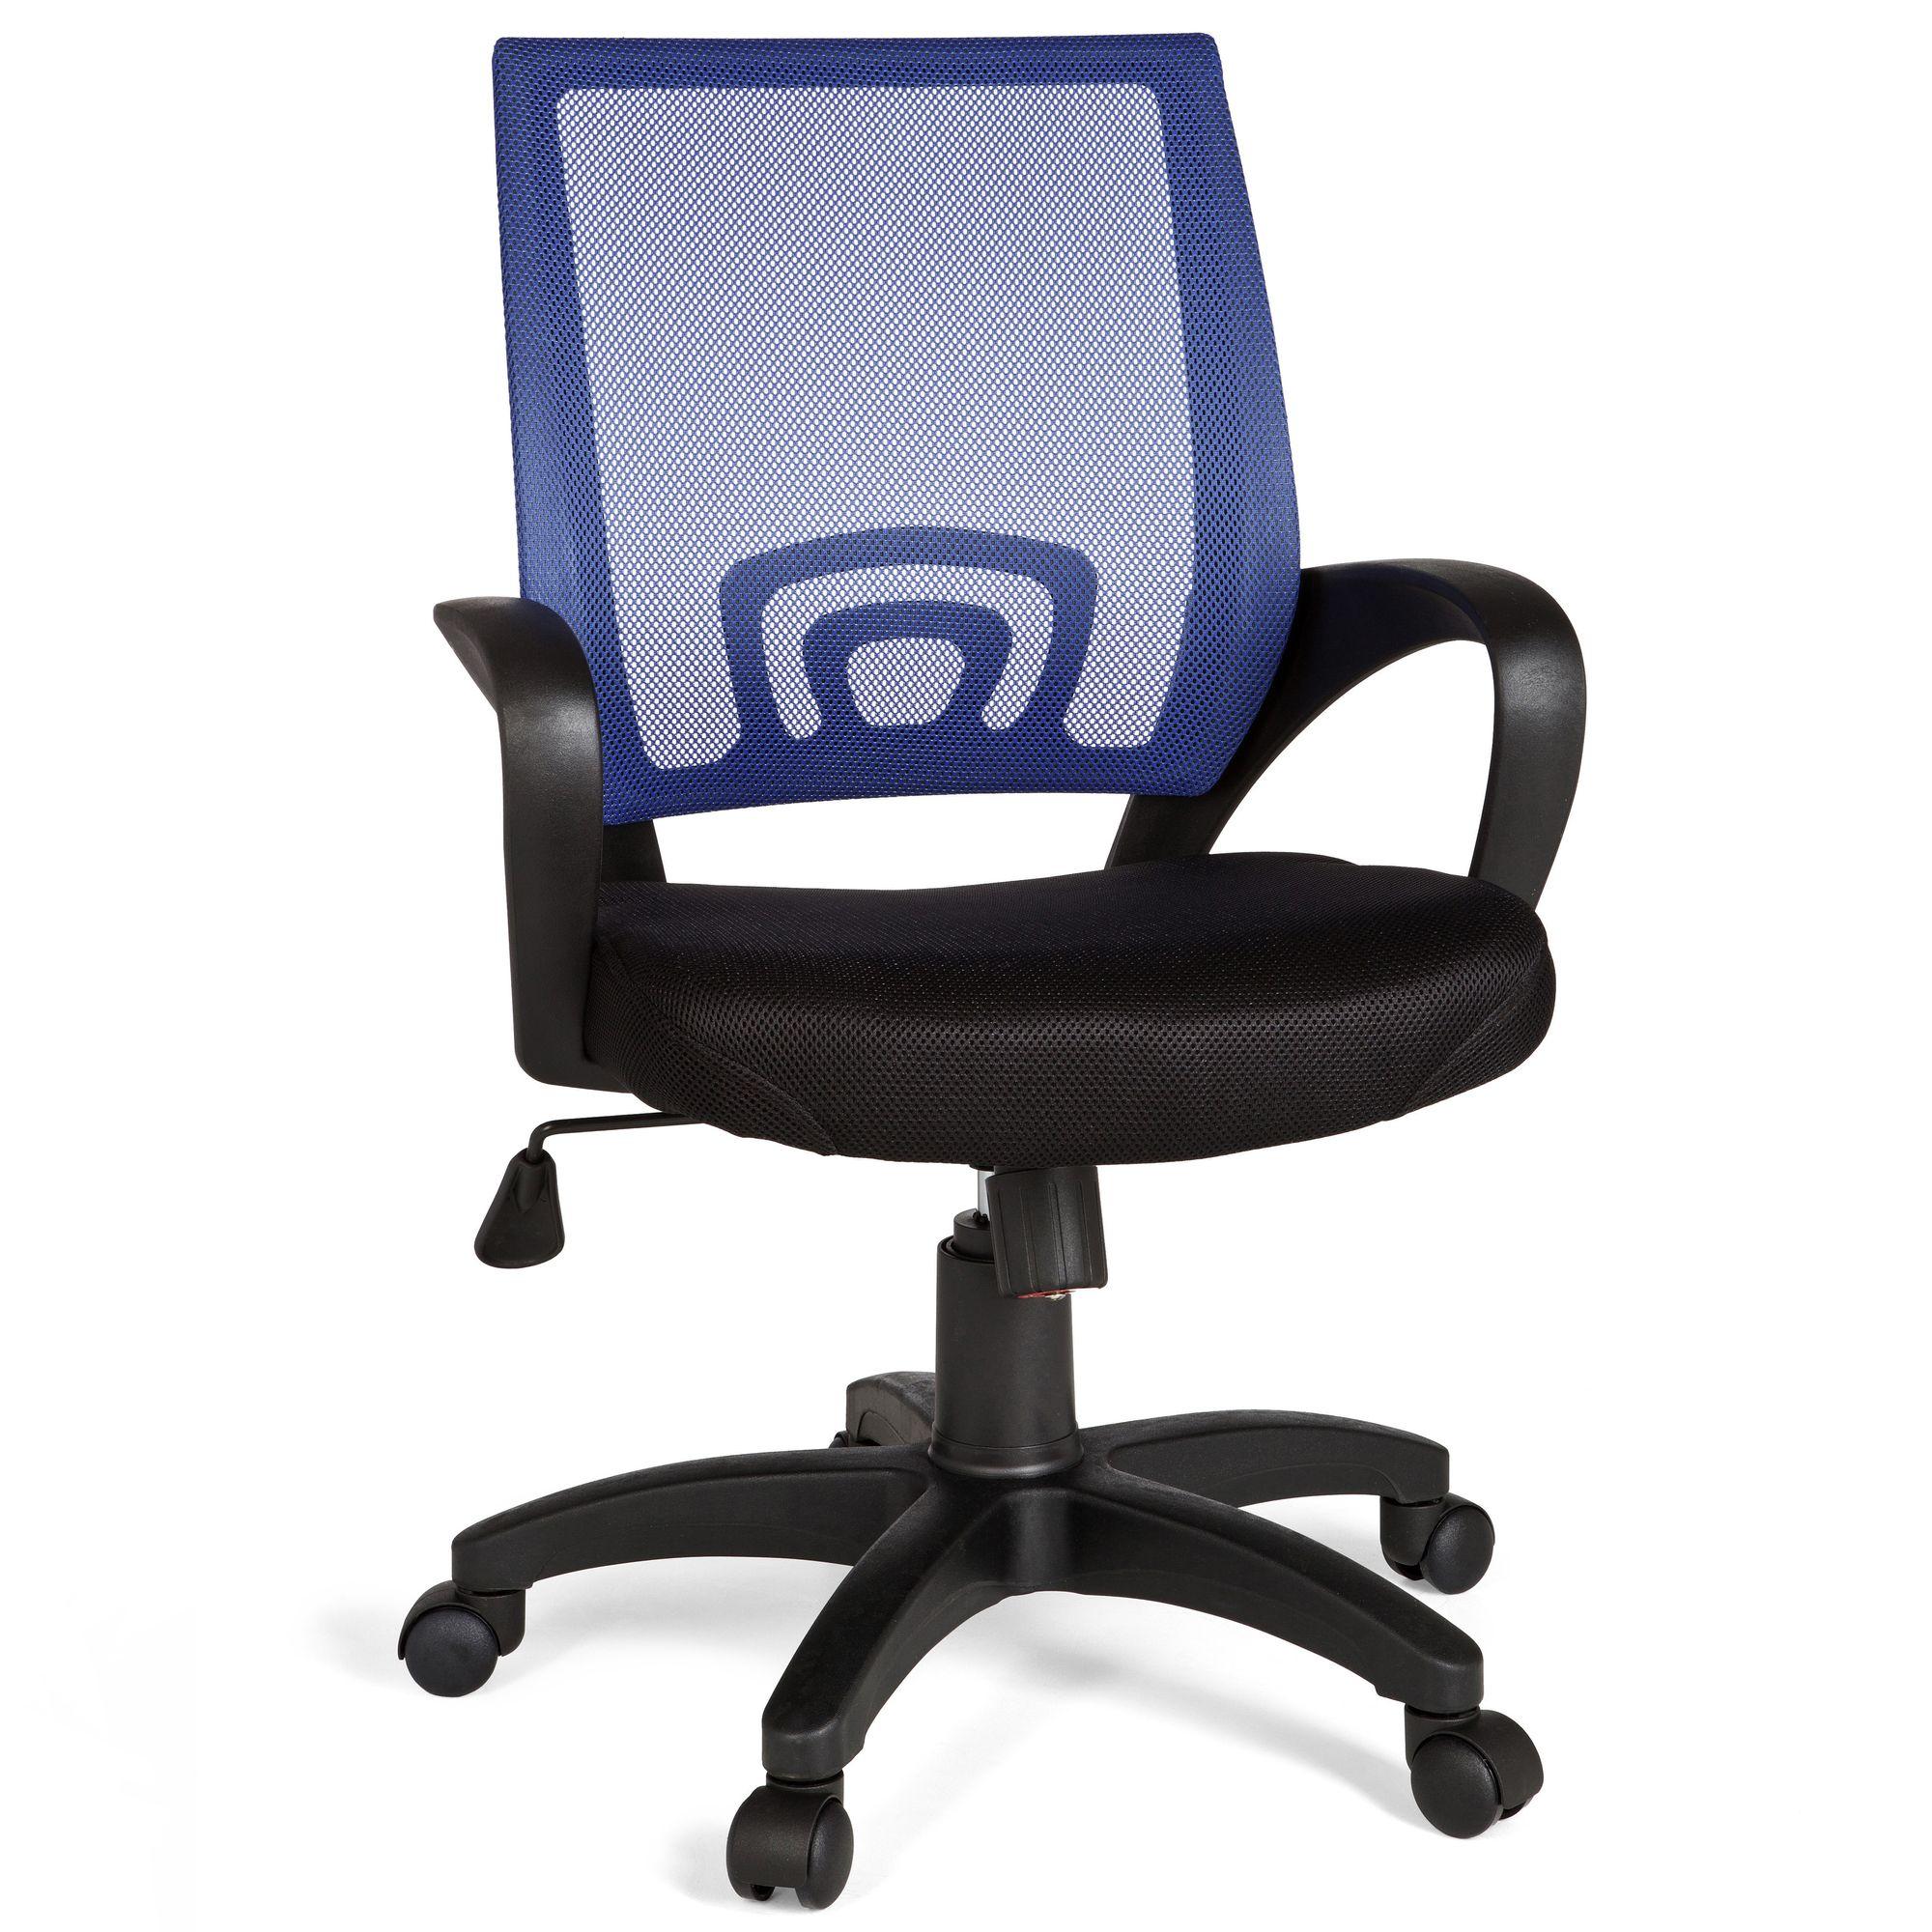 Picturesque Schreibtischstuhl Ohne Armlehne Reference Of Finebuy Bürostuhl Oleg Stoff Drehstuhl Mit Jugend-stuhl